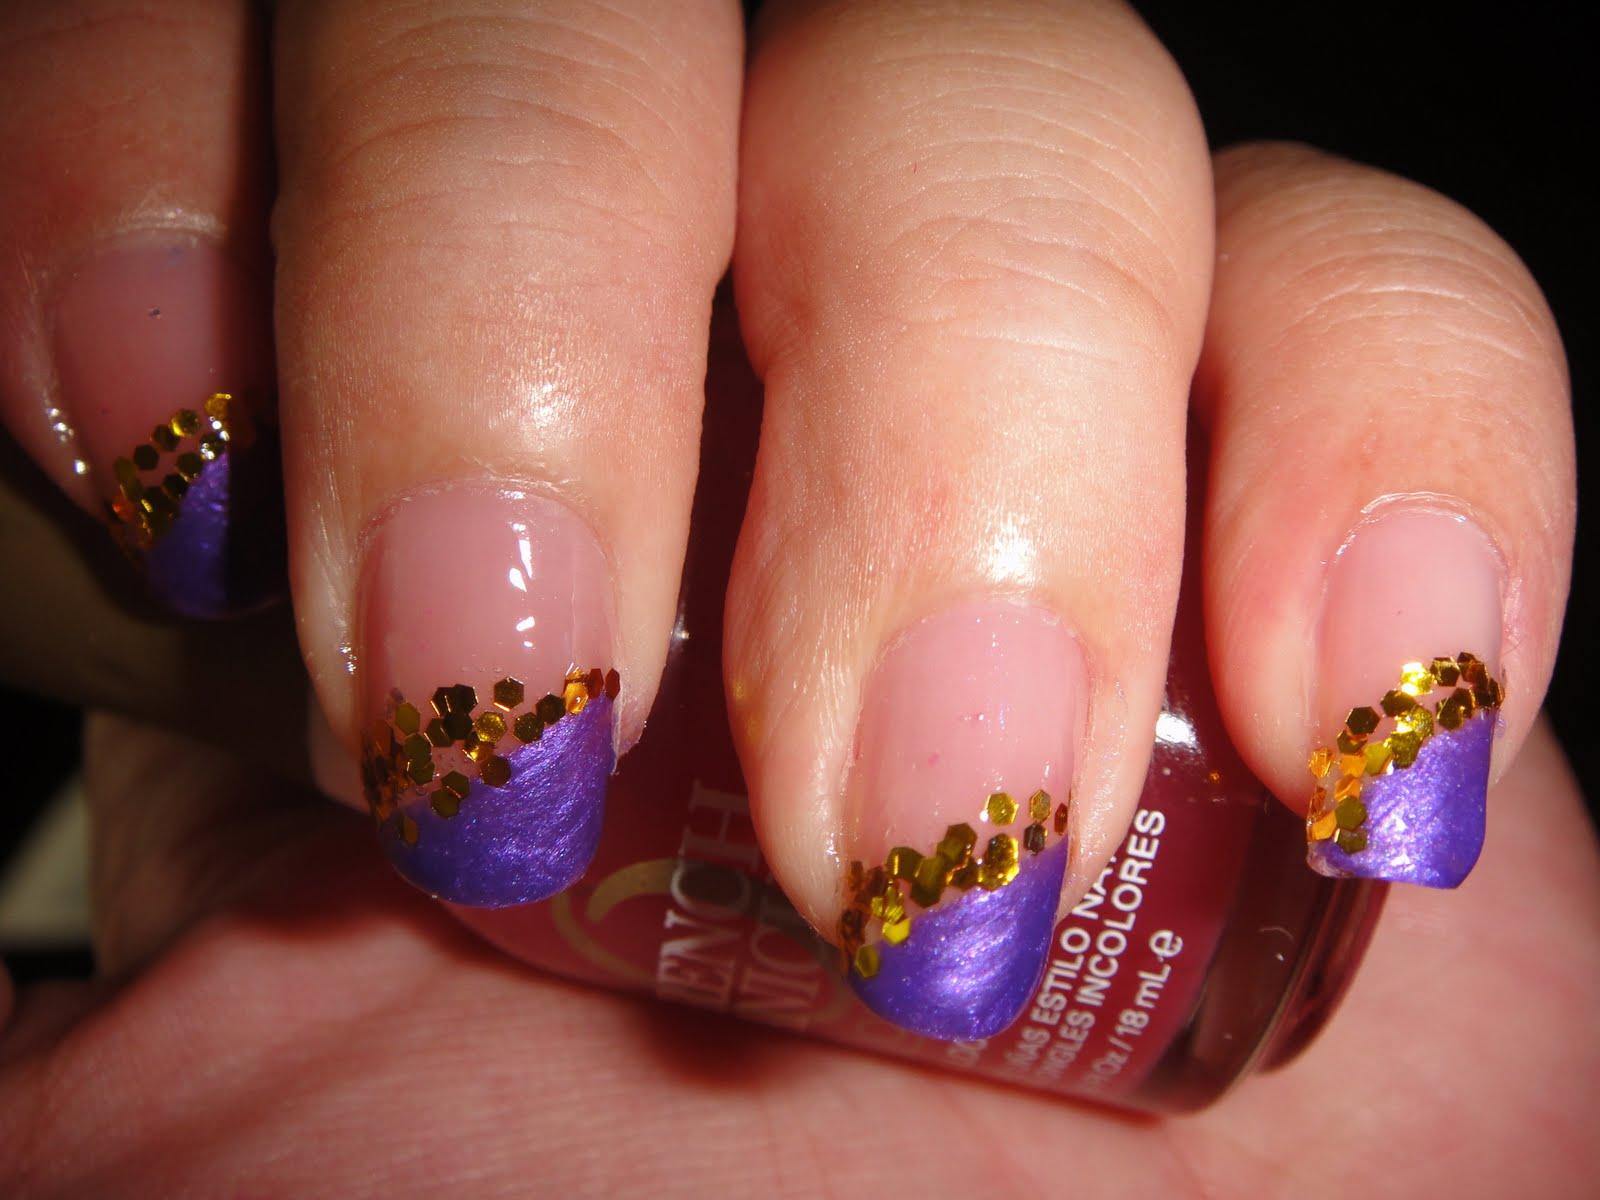 Juicy Nails & Makeup!: Gelish Polish Review